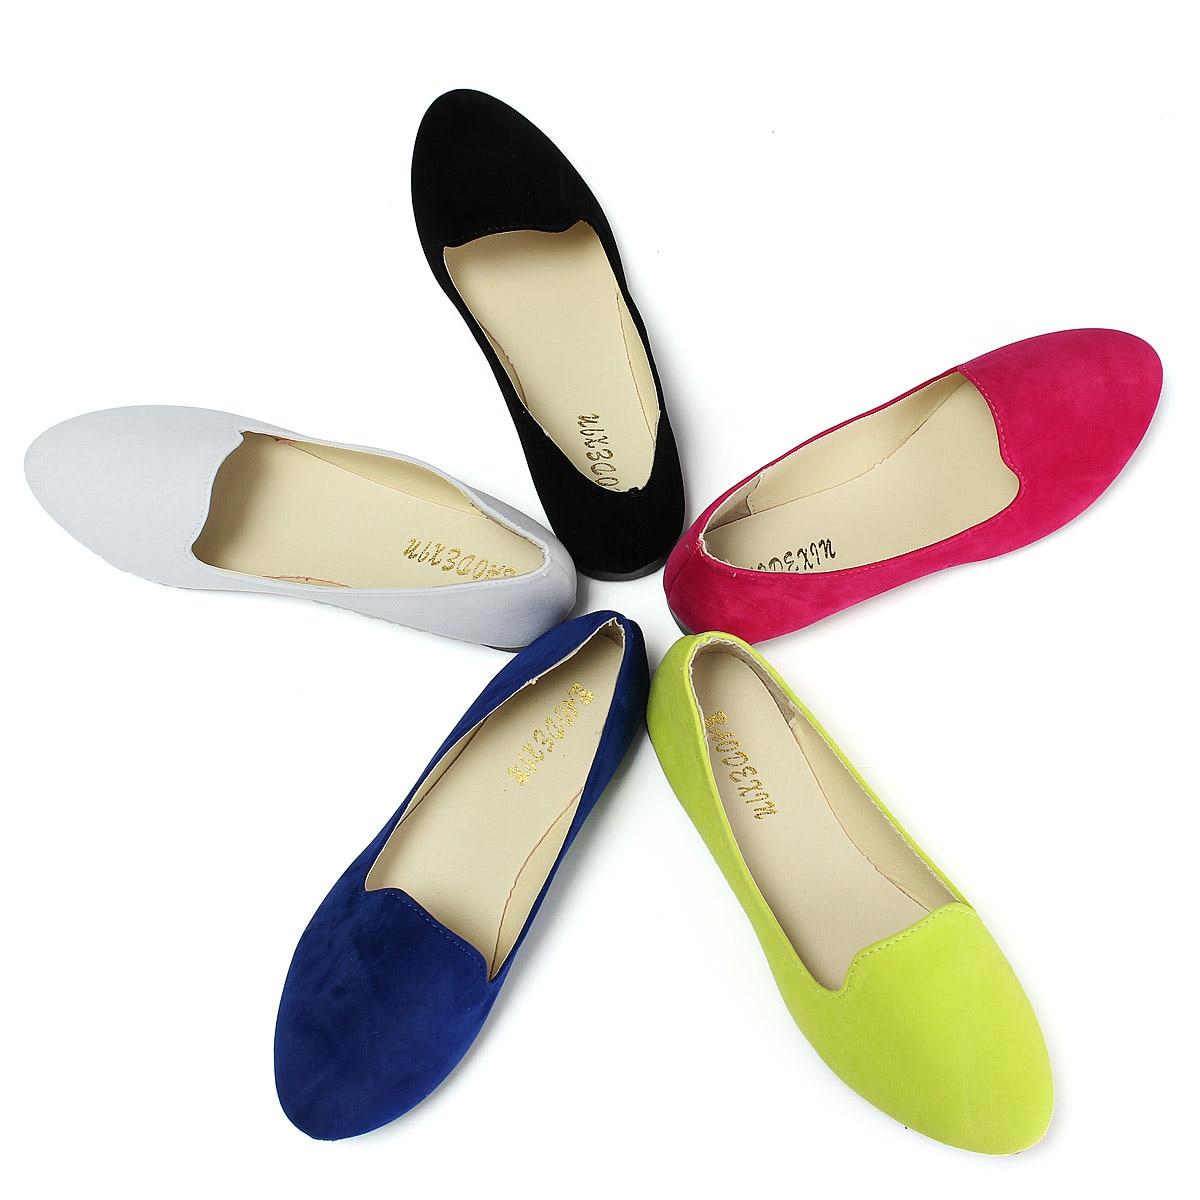 flats wide hesstonspeedway info most comfy comforter feet comfortable for ballet travel